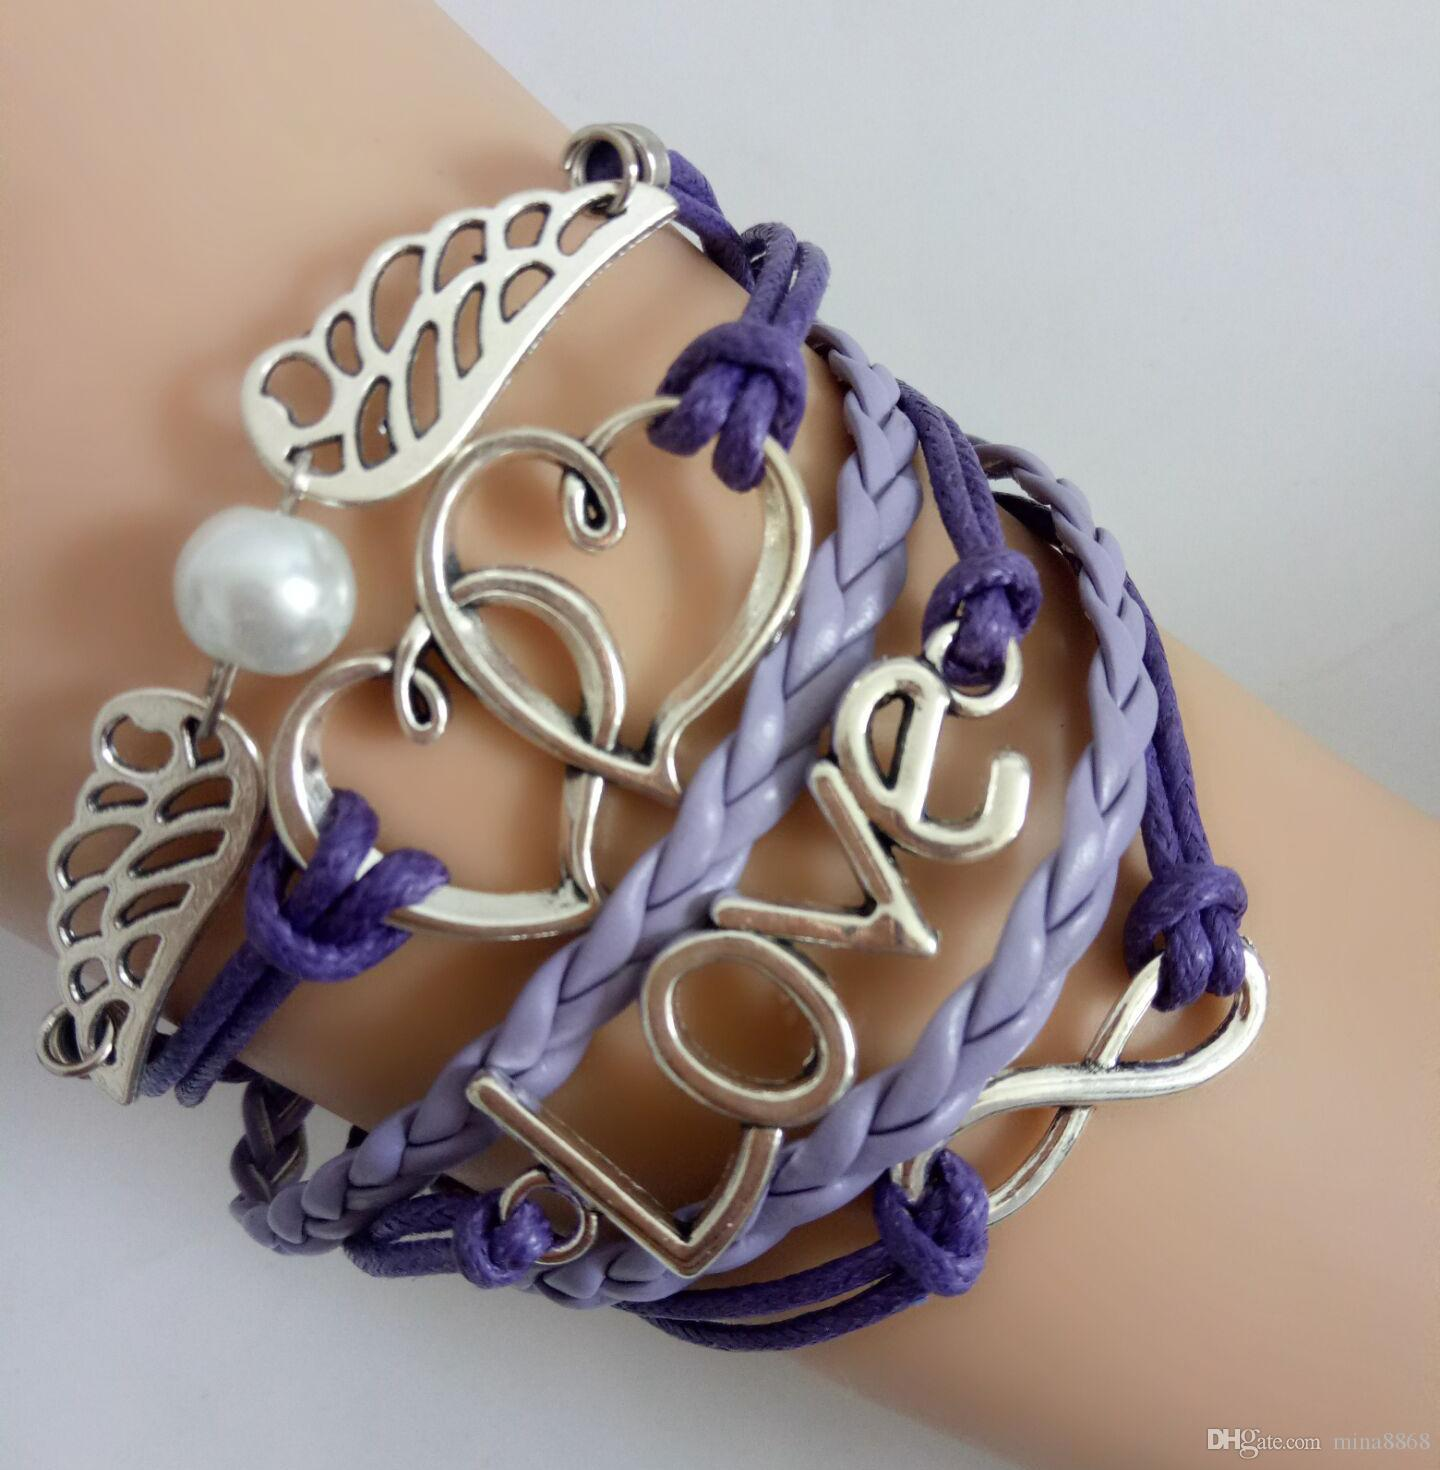 Wholesale Fashion purple lmultilayer Wrap Leather Bracelet Punk Infinity LOVE Anchors Charm Bracelets for women & men Statement Jewelry